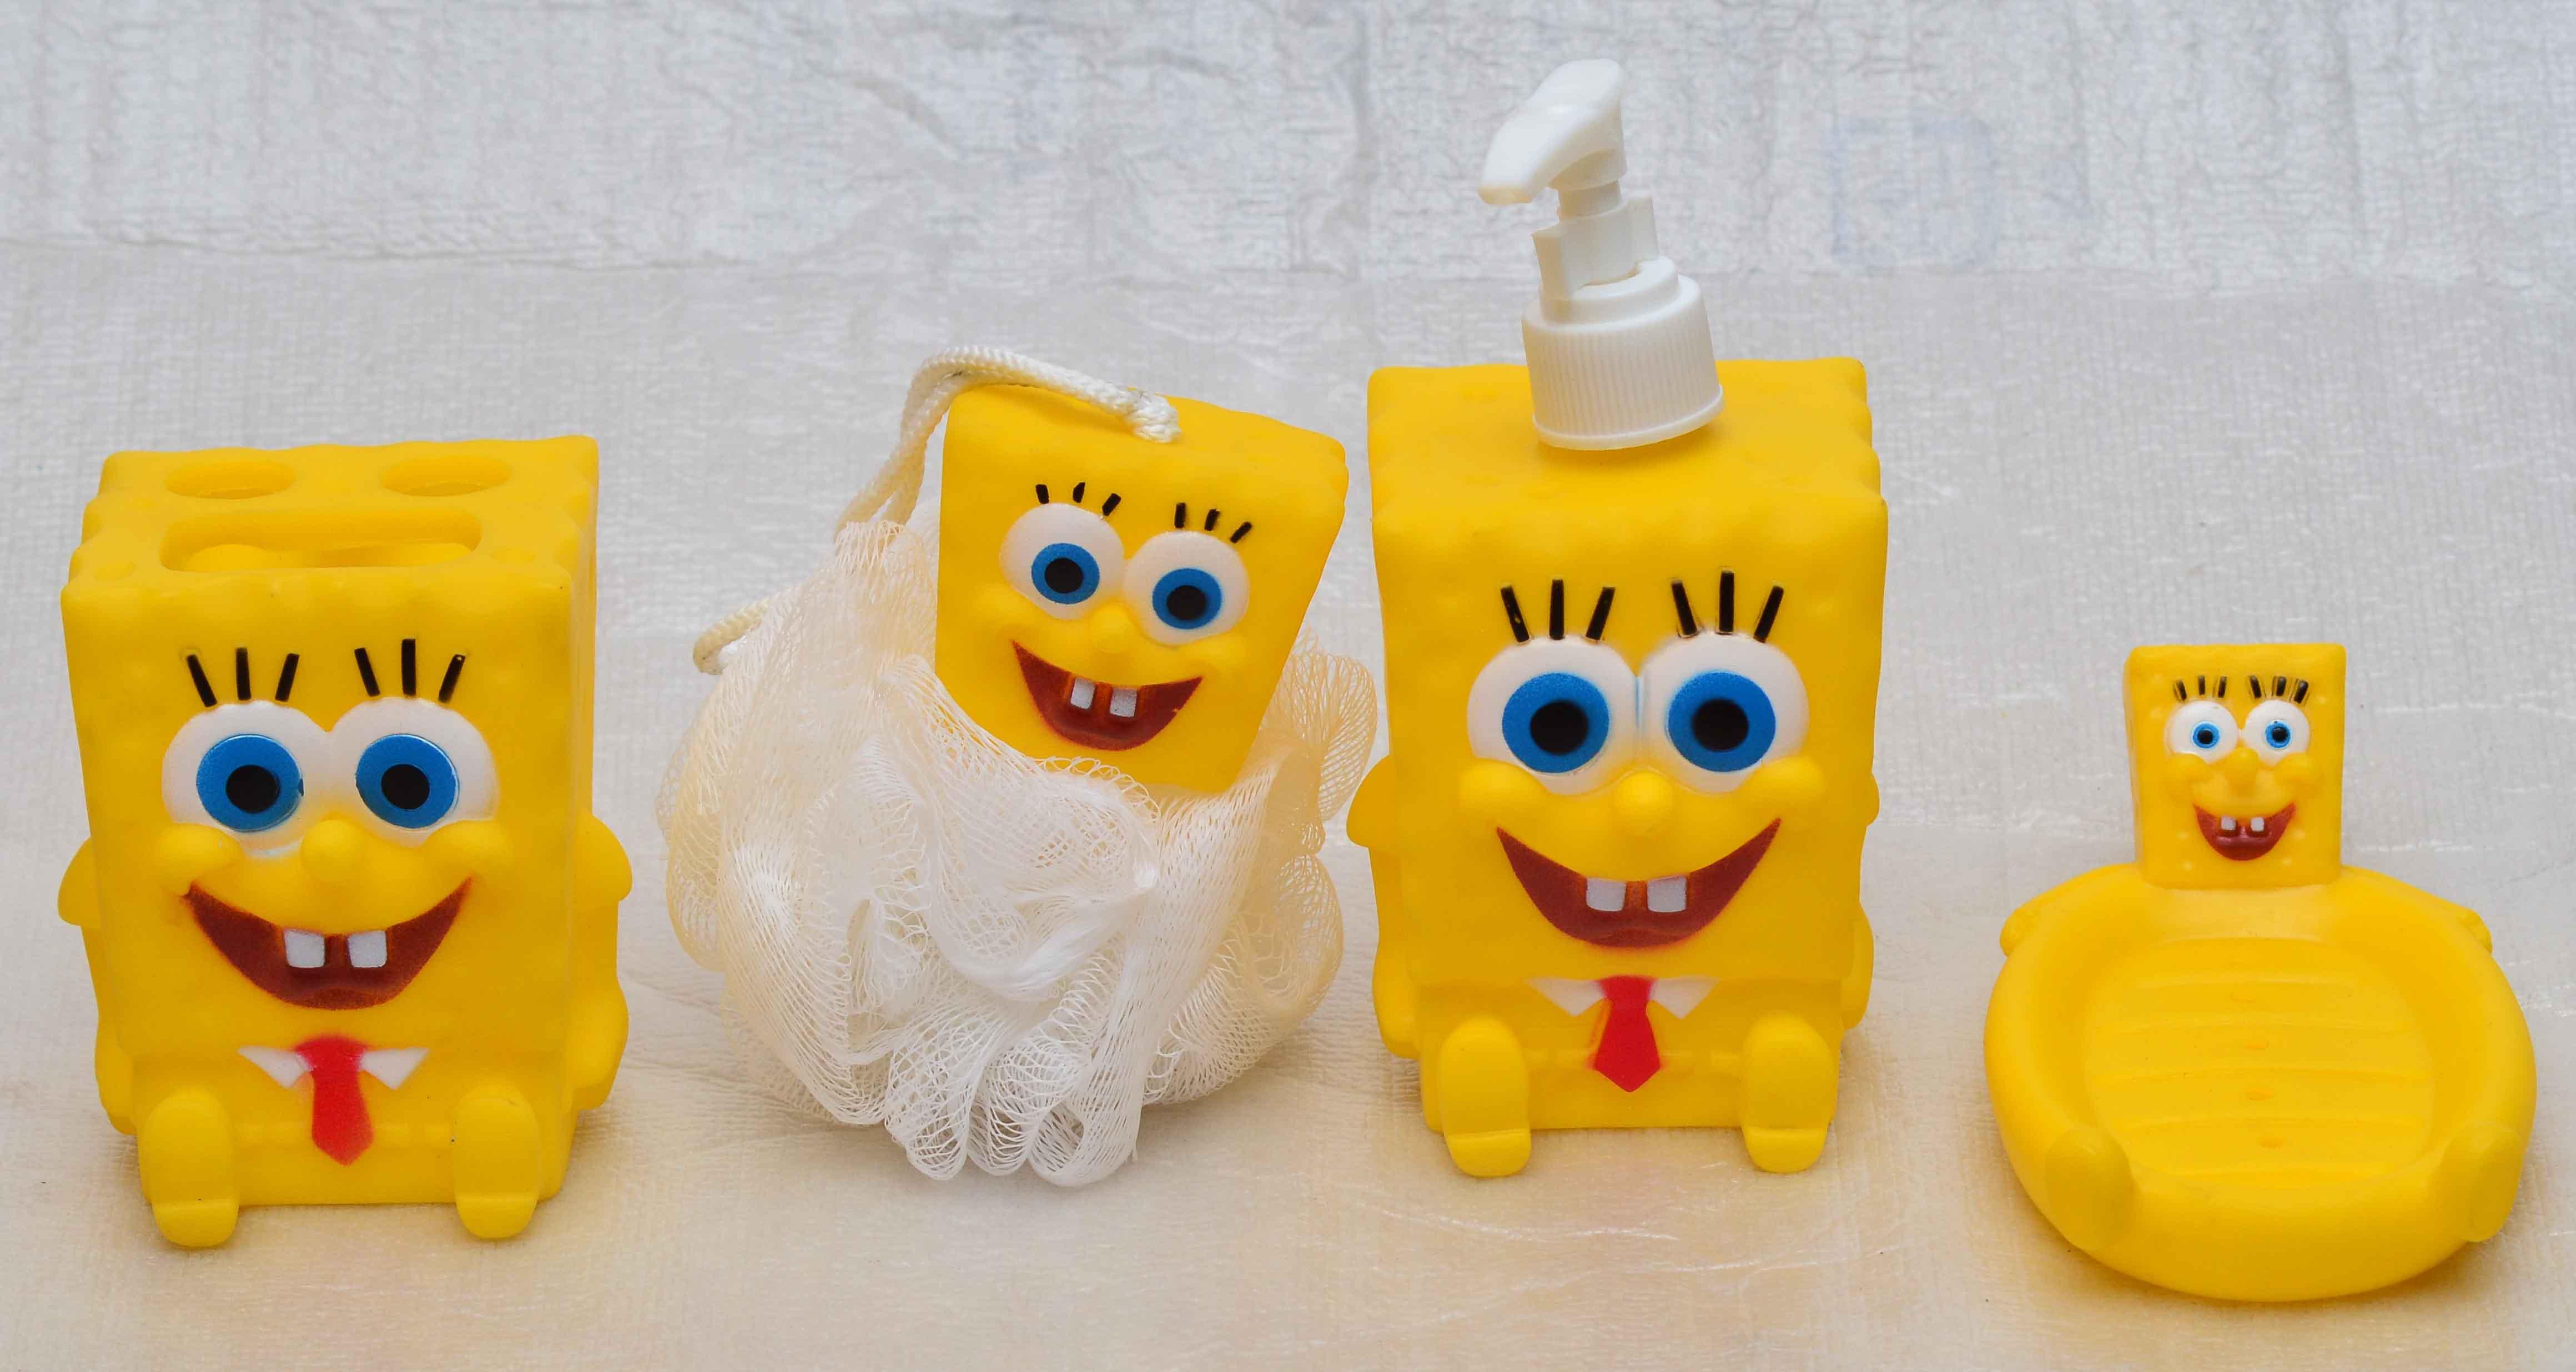 Spongebob squarepants bathroom accessories - Spongebob Bathroom Set Kids Accessories On Nickelodeon